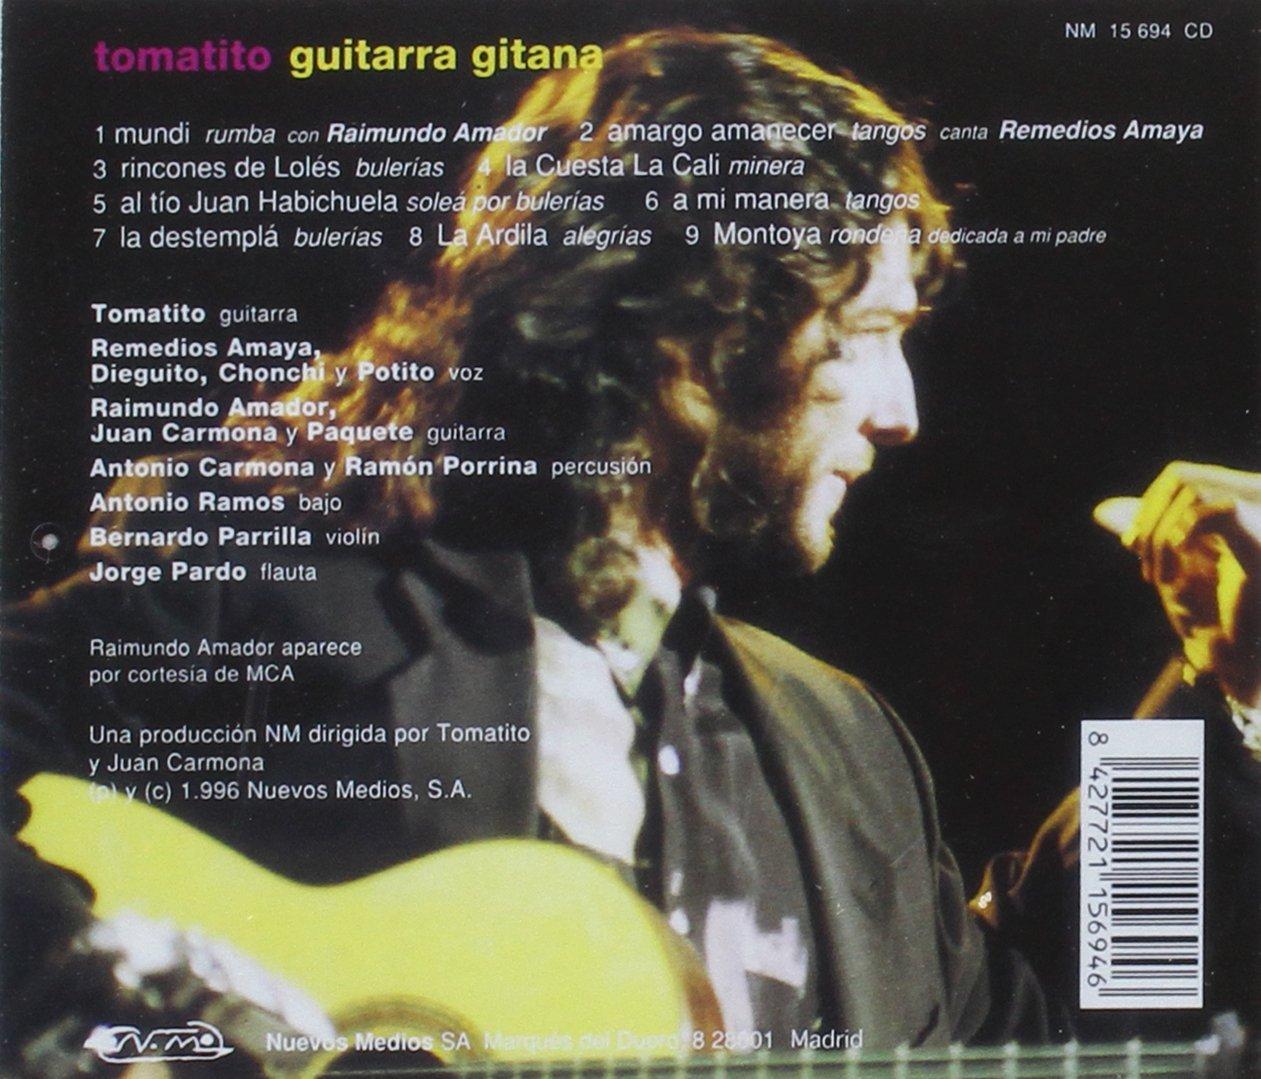 Guitarra Gitana: Tomatito: Amazon.es: Música